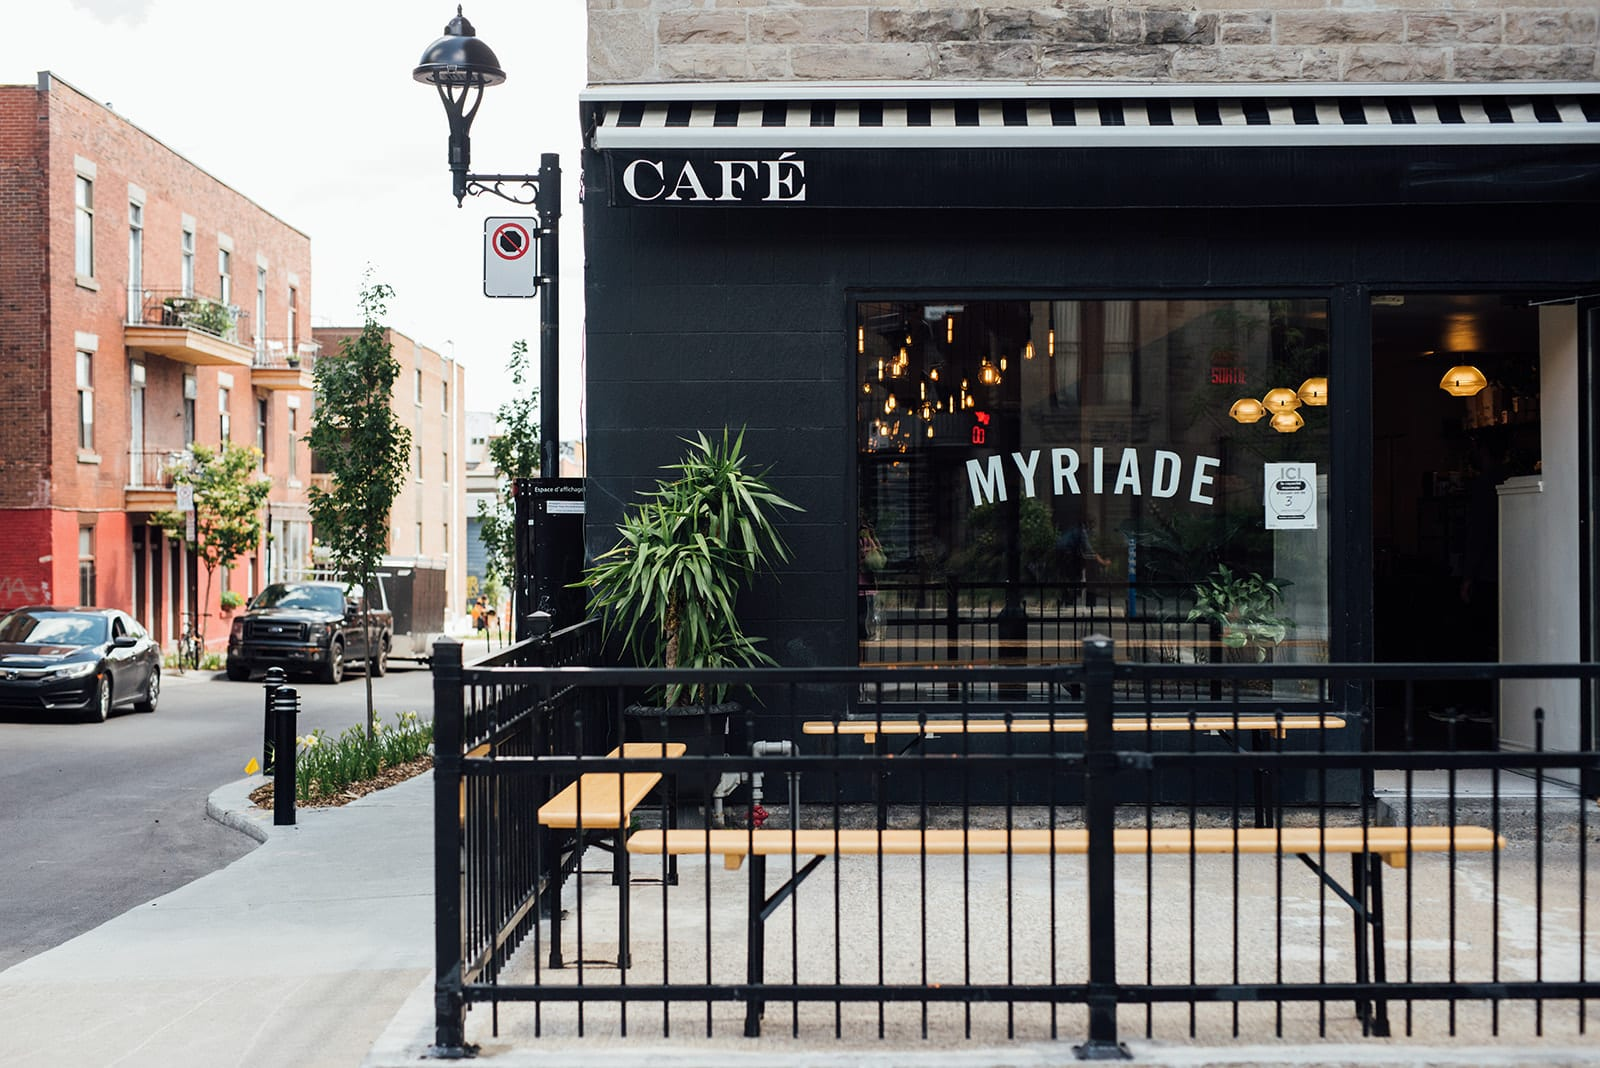 saint-denis cafés où travailler myriade